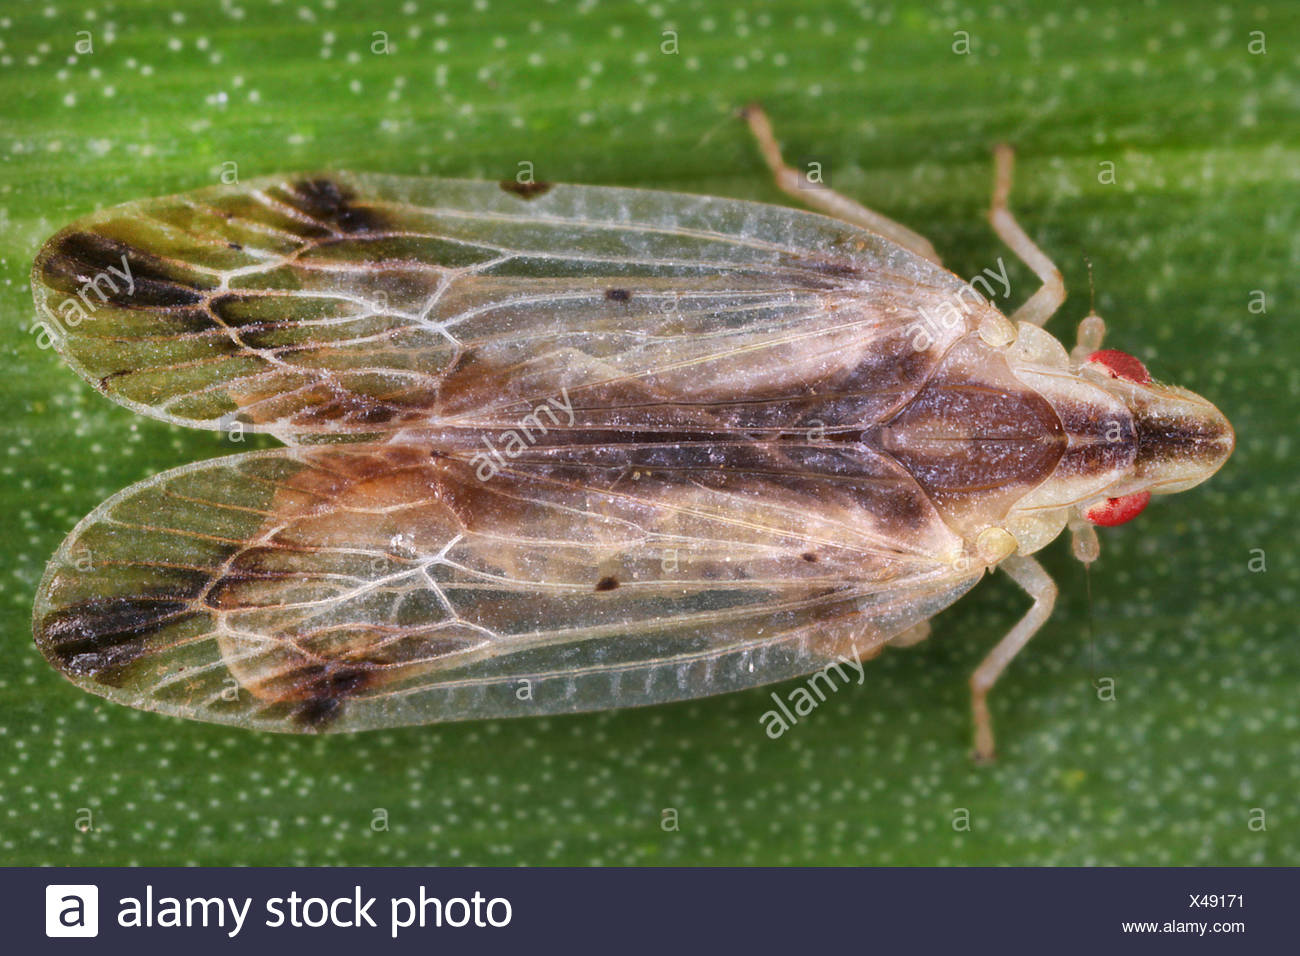 Mueckenzikade, Muecken-Zikade (Tropiduchidae), sitzt auf einem Blatt, Costa Rica   Tropiduchid planthopper (Tropiduchidae), sits - Stock Image